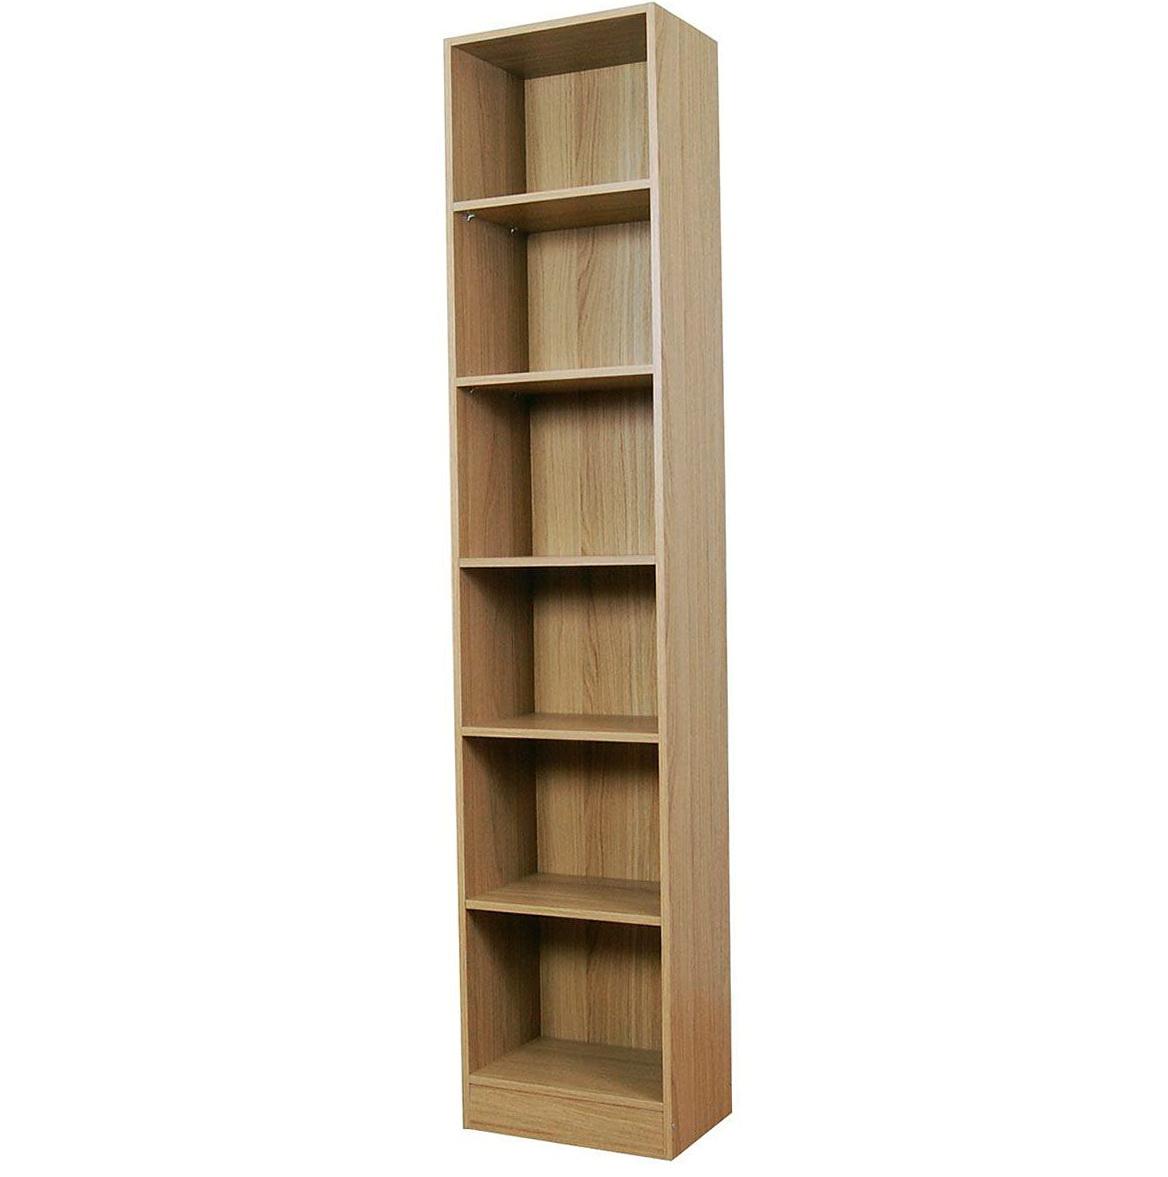 Tall Narrow Bookcase Walmart